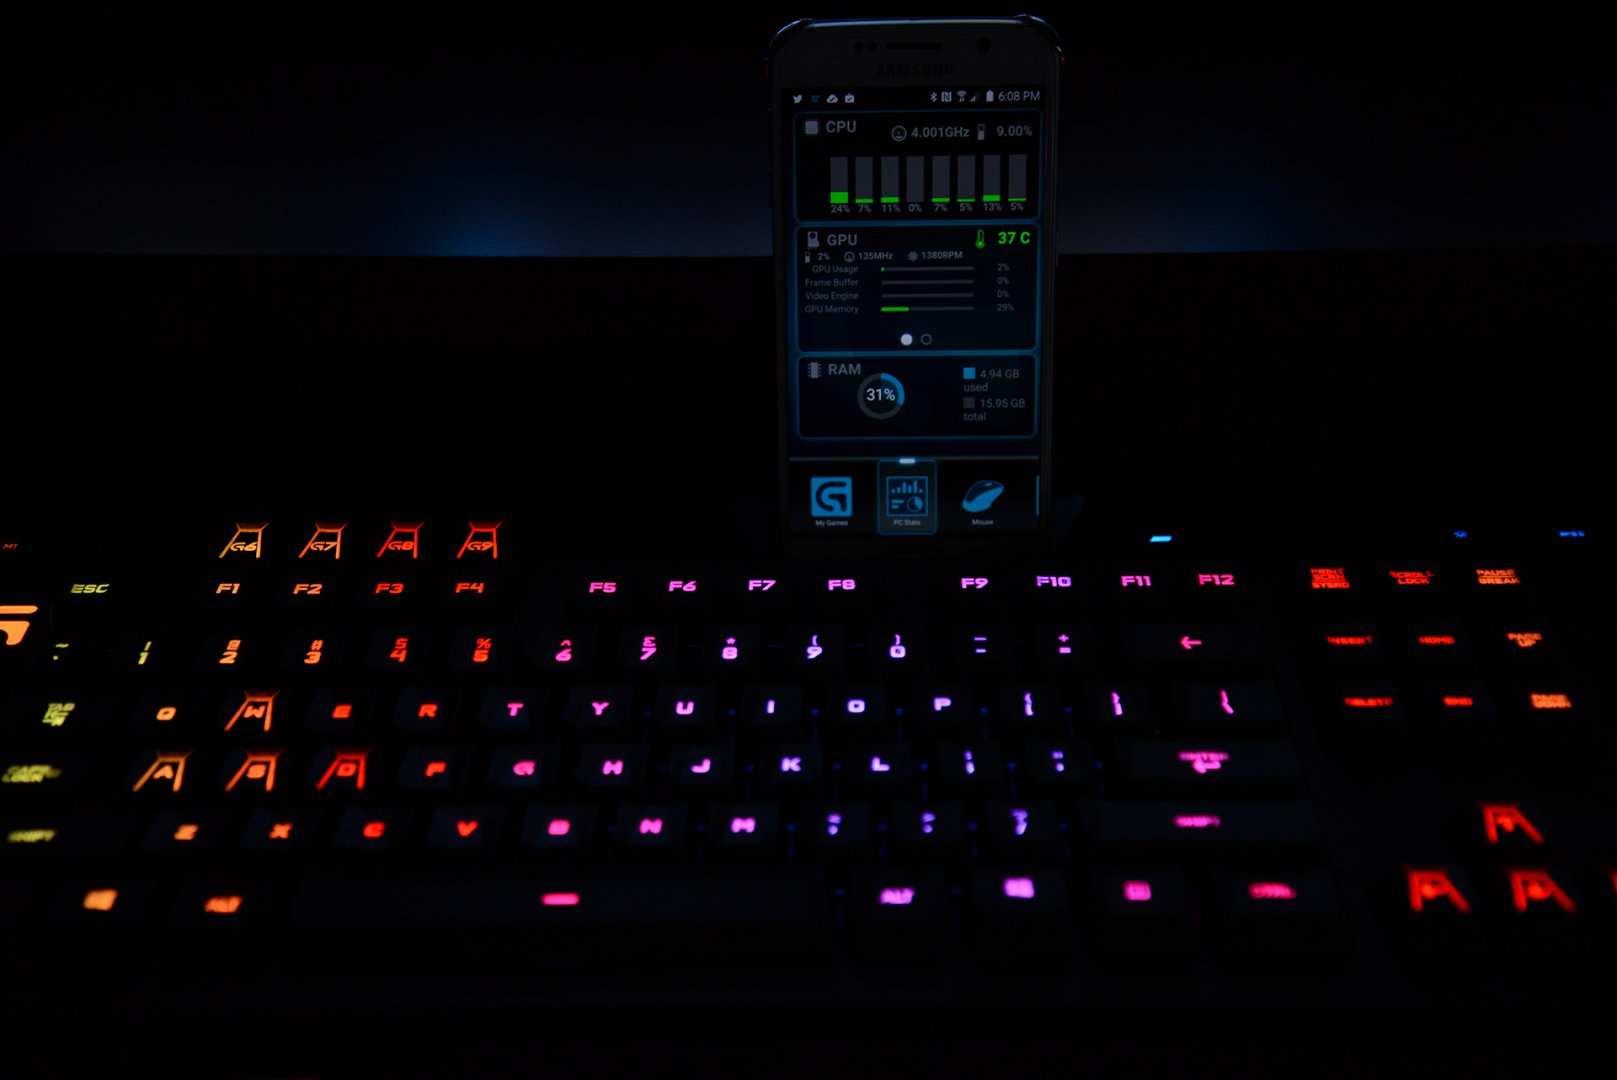 Co-Optimus - News - Logitech G910 Orion Mechanical Keyboard